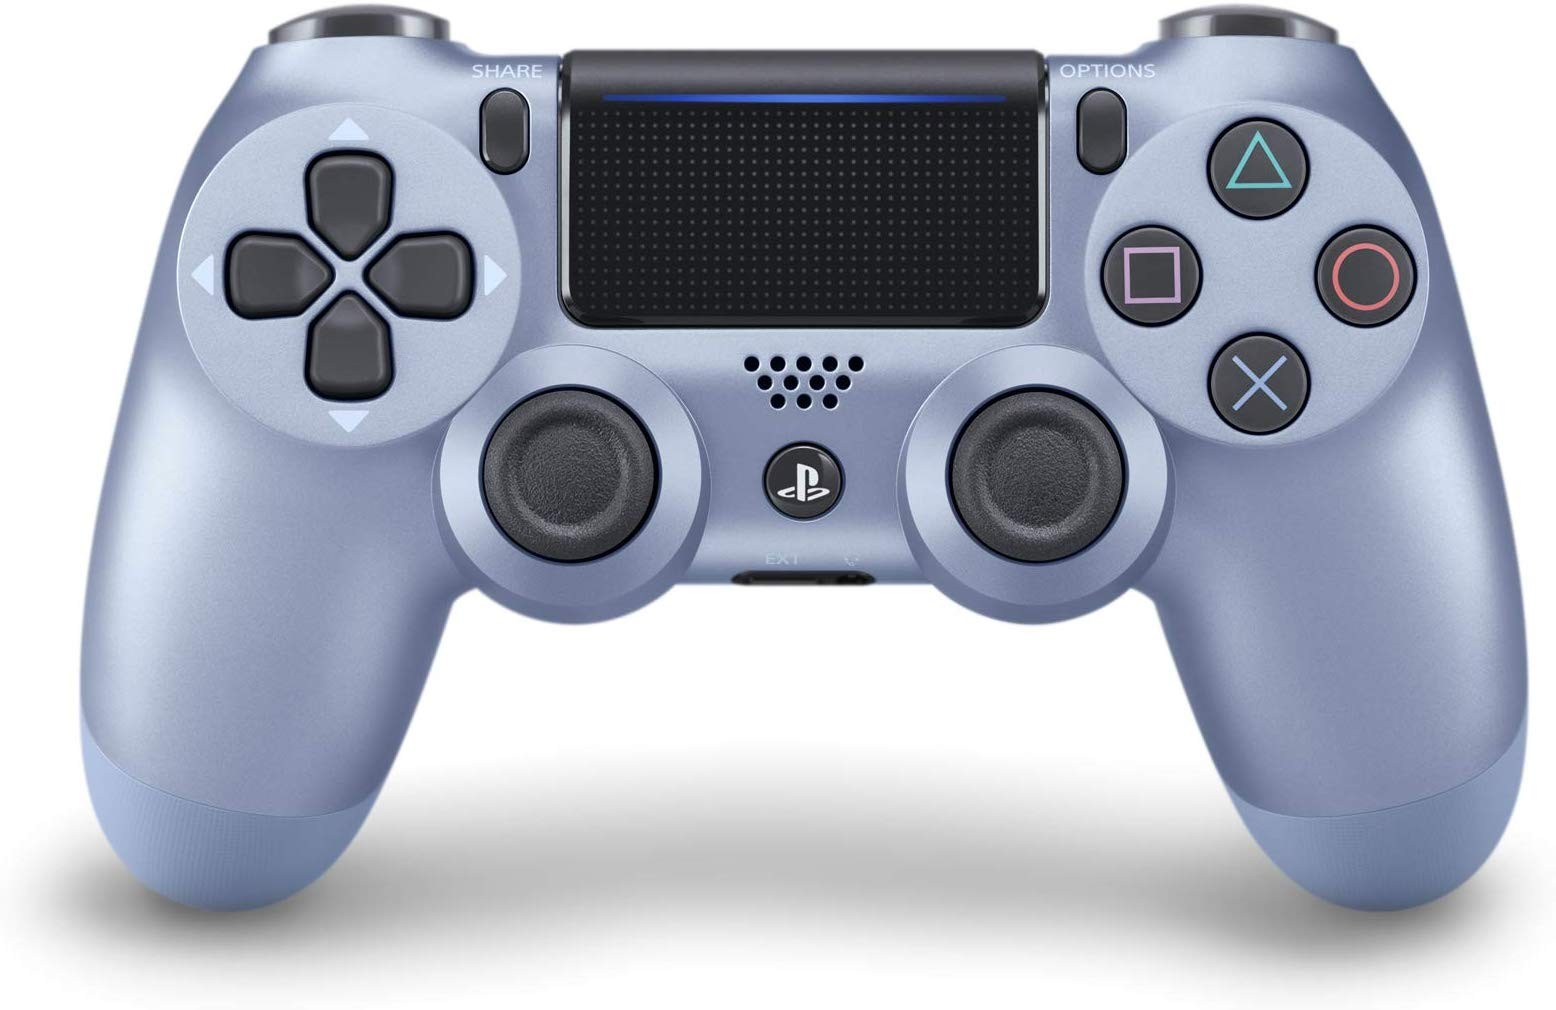 Бездротовий контролер/джойстик/геймпад DualShock 4 Wireless Controller Titanium Blue V2